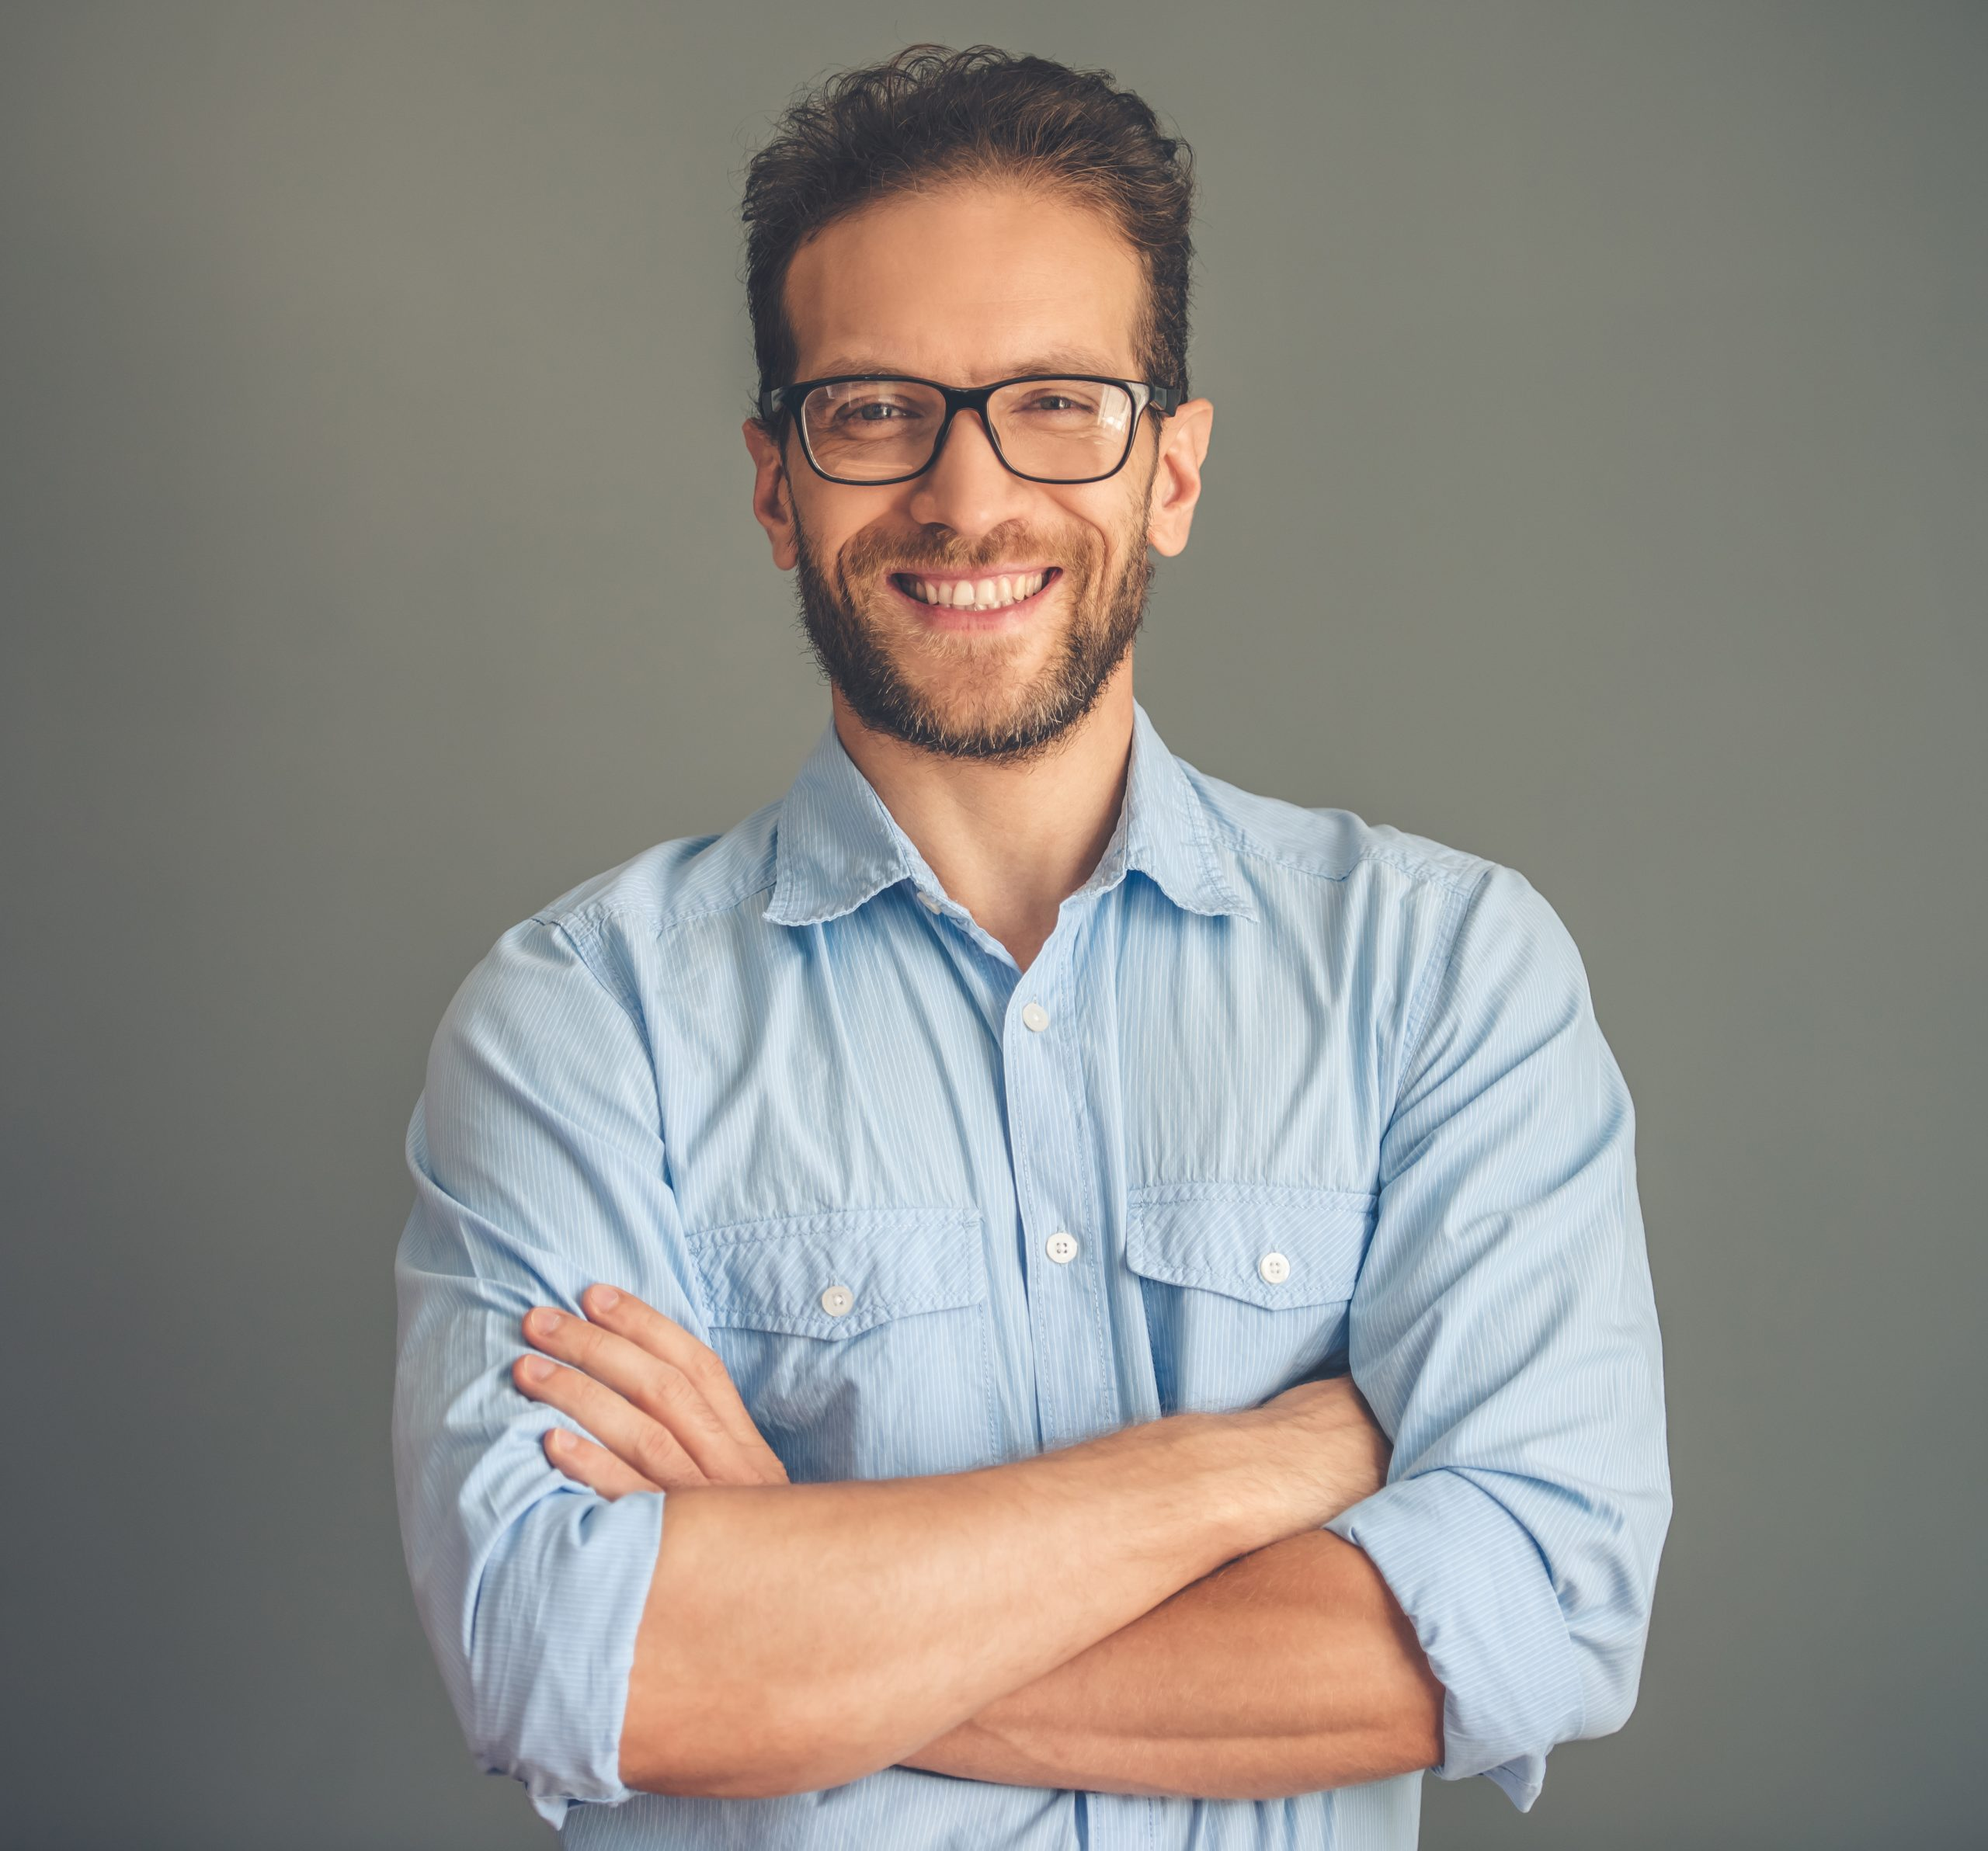 Daniel Marlin